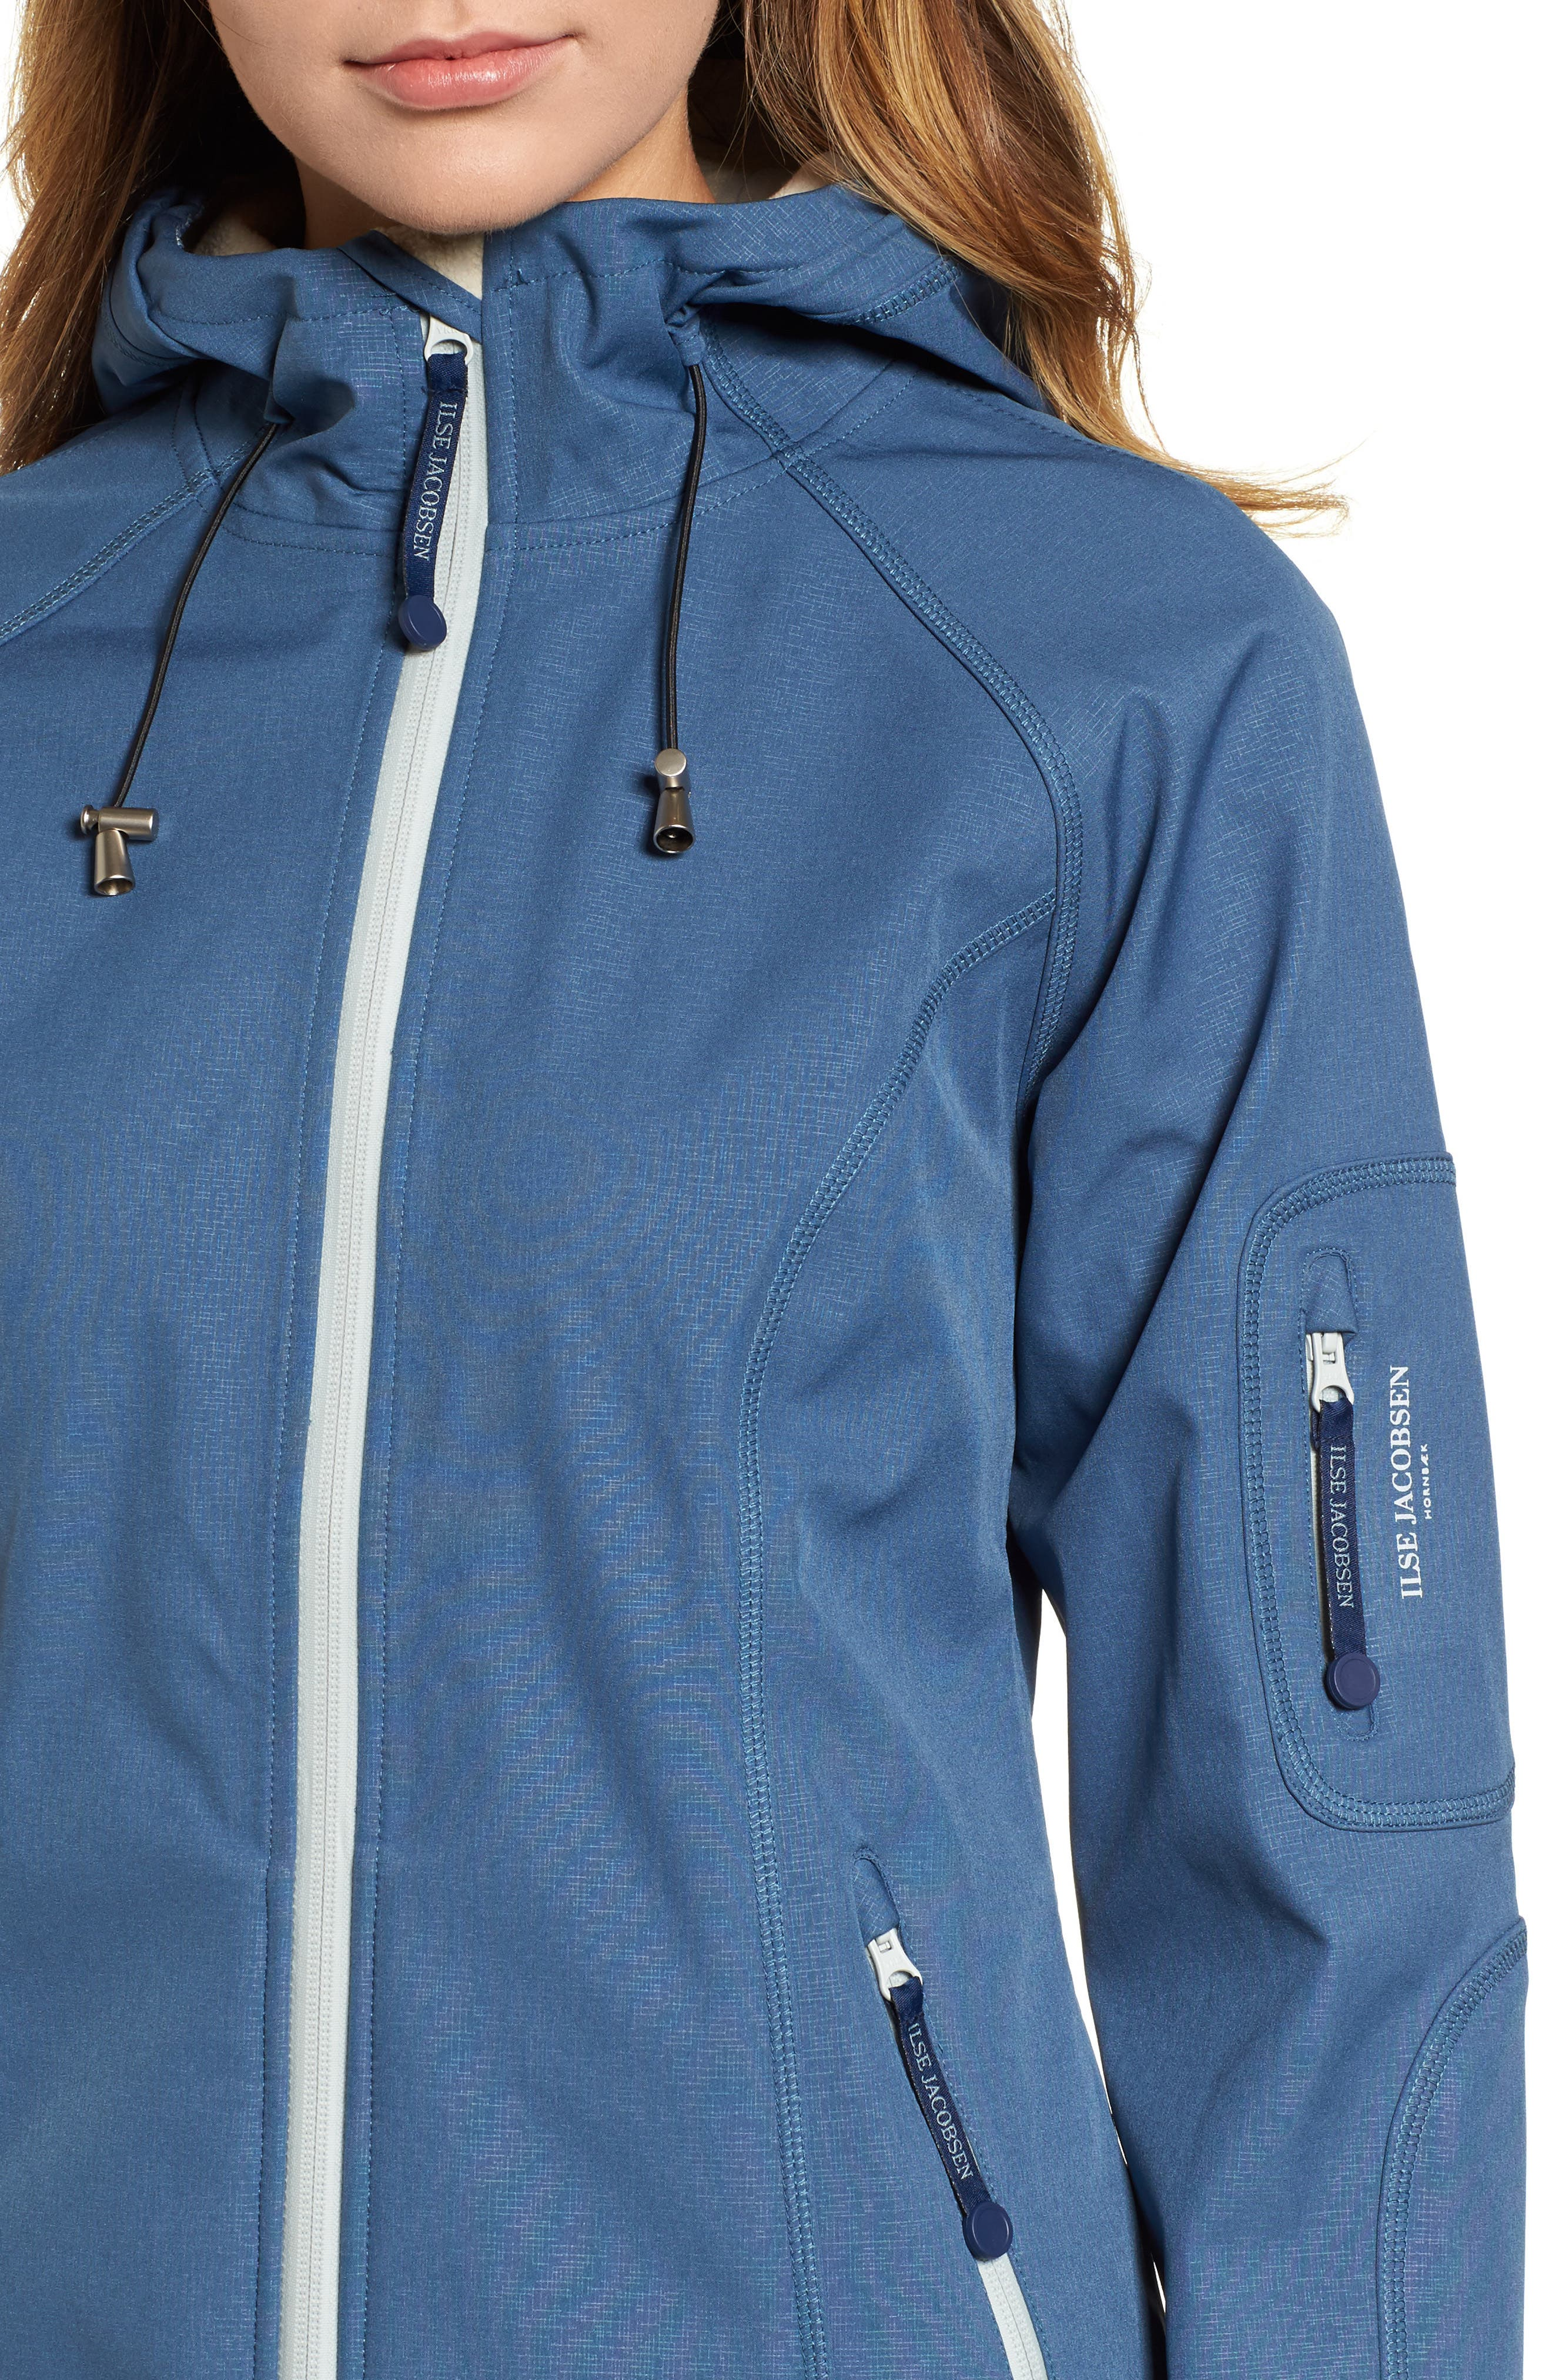 Regular Fit Hooded Raincoat,                             Alternate thumbnail 4, color,                             400